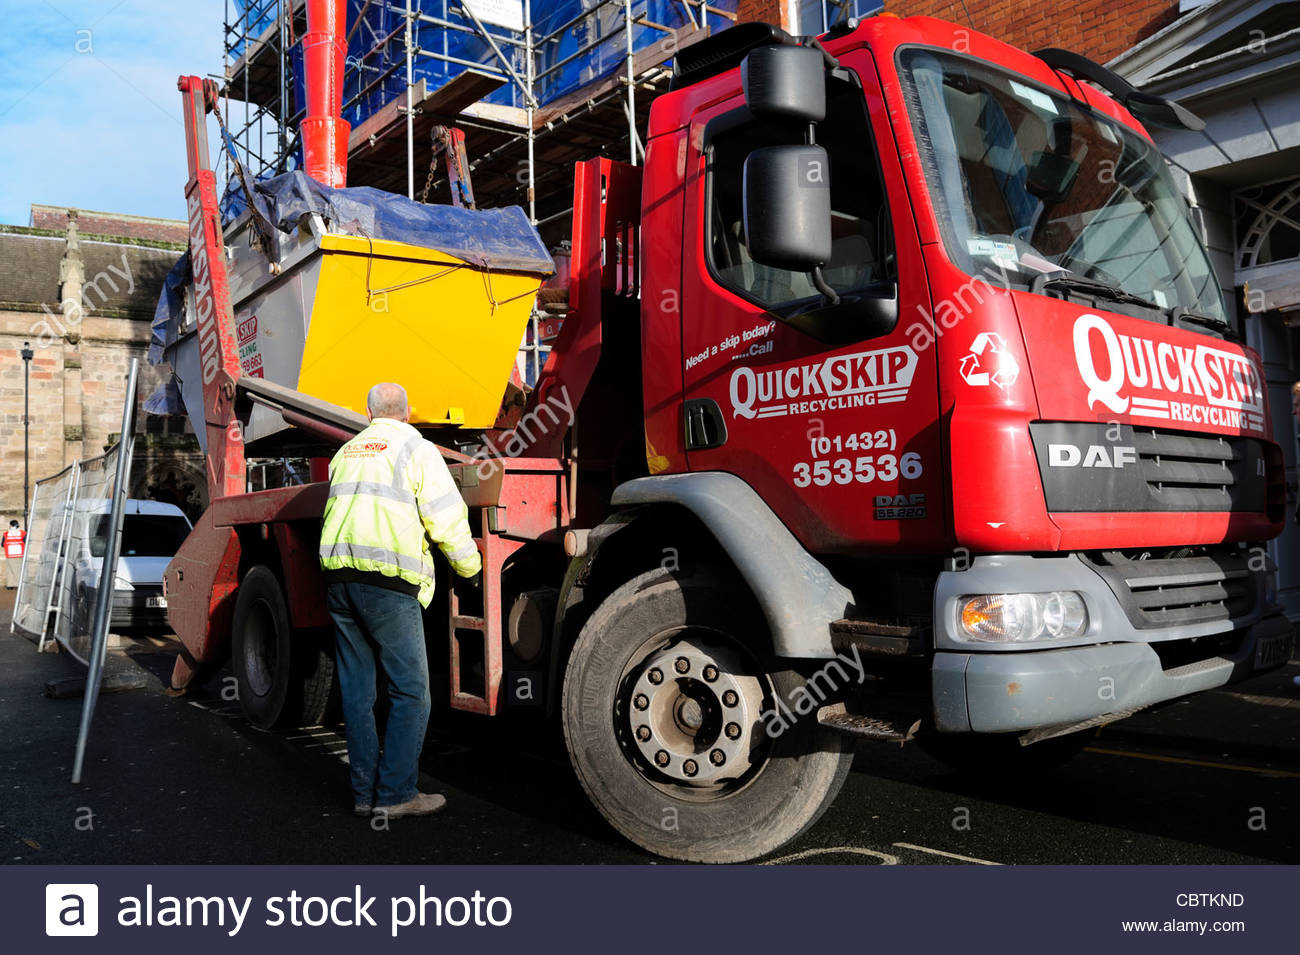 731844bd39 Skip Lorry Stock Photos   Skip Lorry Stock Images - Alamy